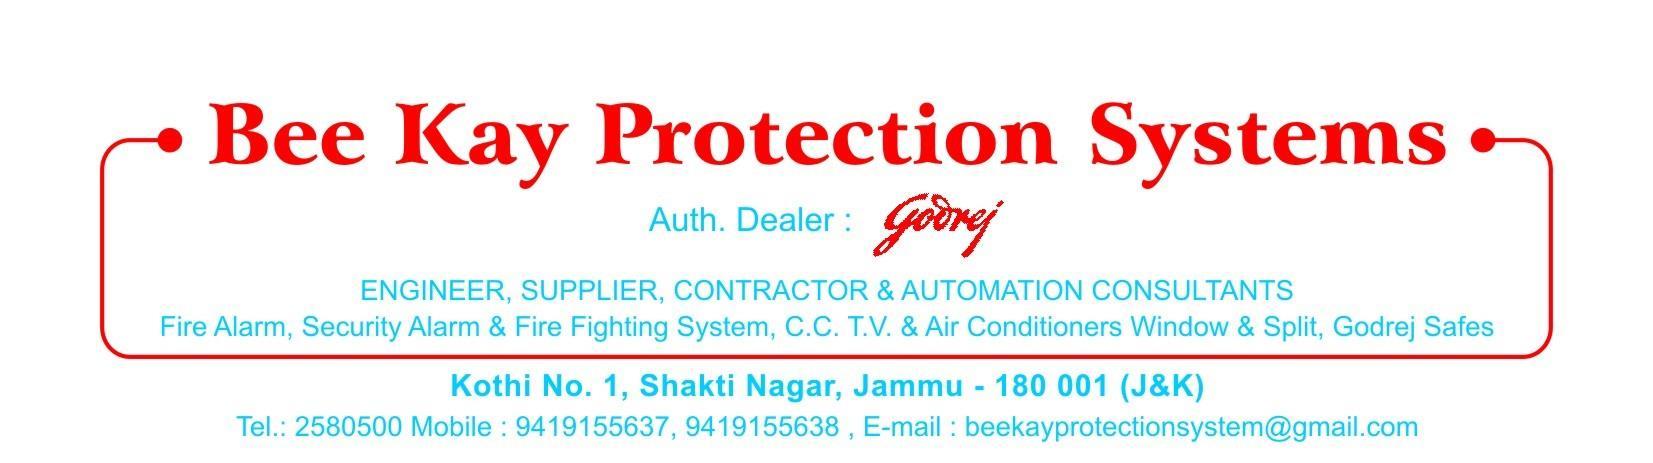 E-Mail: beekayprotectionsystem@gmail.com Mobile: 9419155637, 9419155638 Tel: 0191-2580500 Address: Kothi N0-1, Shakti Nagar, Near Pawan Fruit Ice-Cream, Jammu-180001 (J& K) - by Bee Kay Protection Systems, Jammu